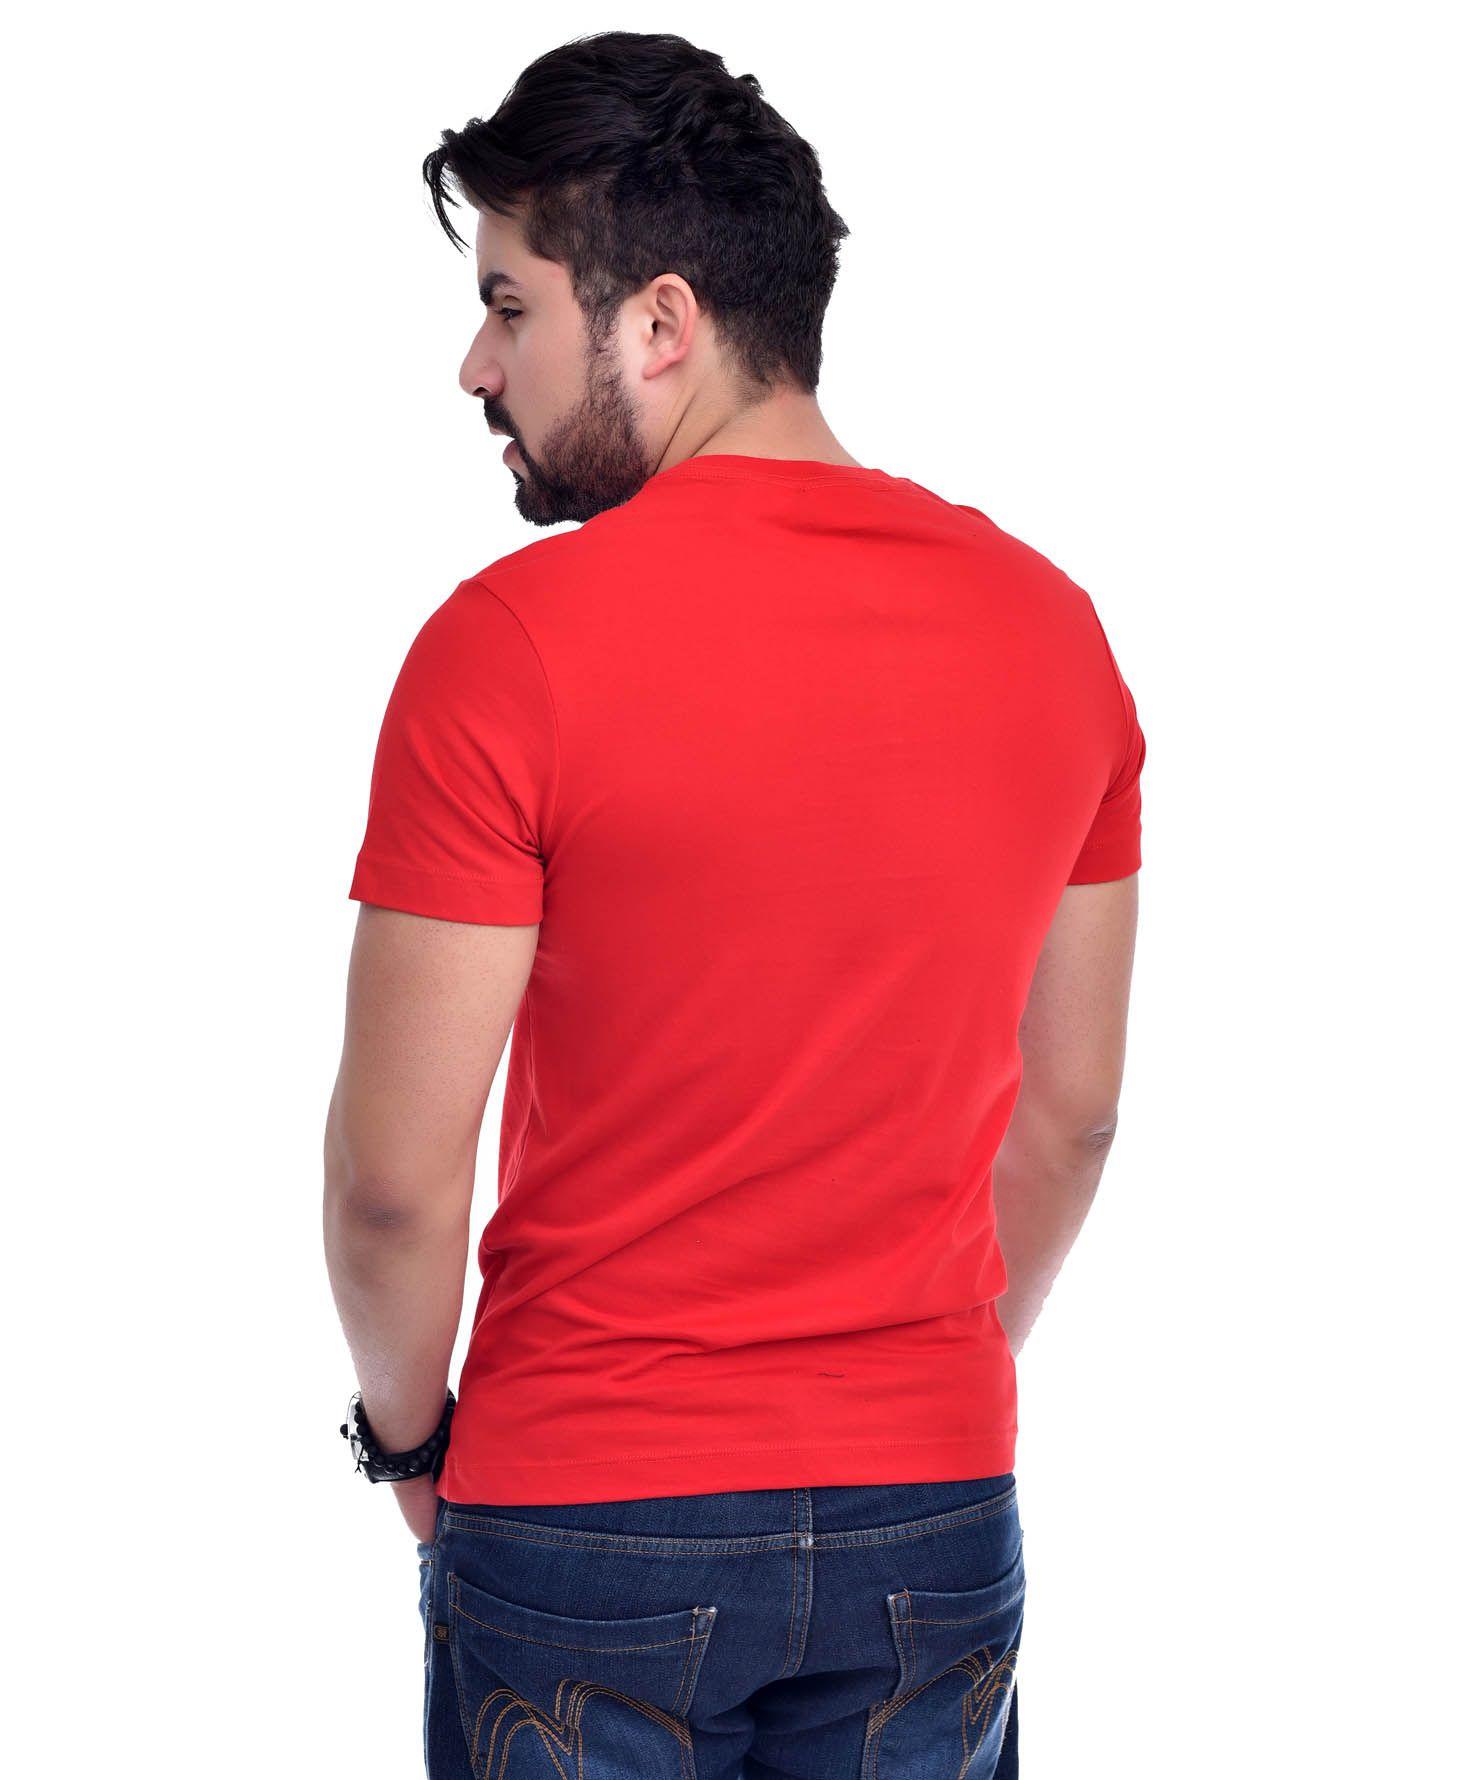 Camiseta L-05 Vermelho  - Ca Brasileira